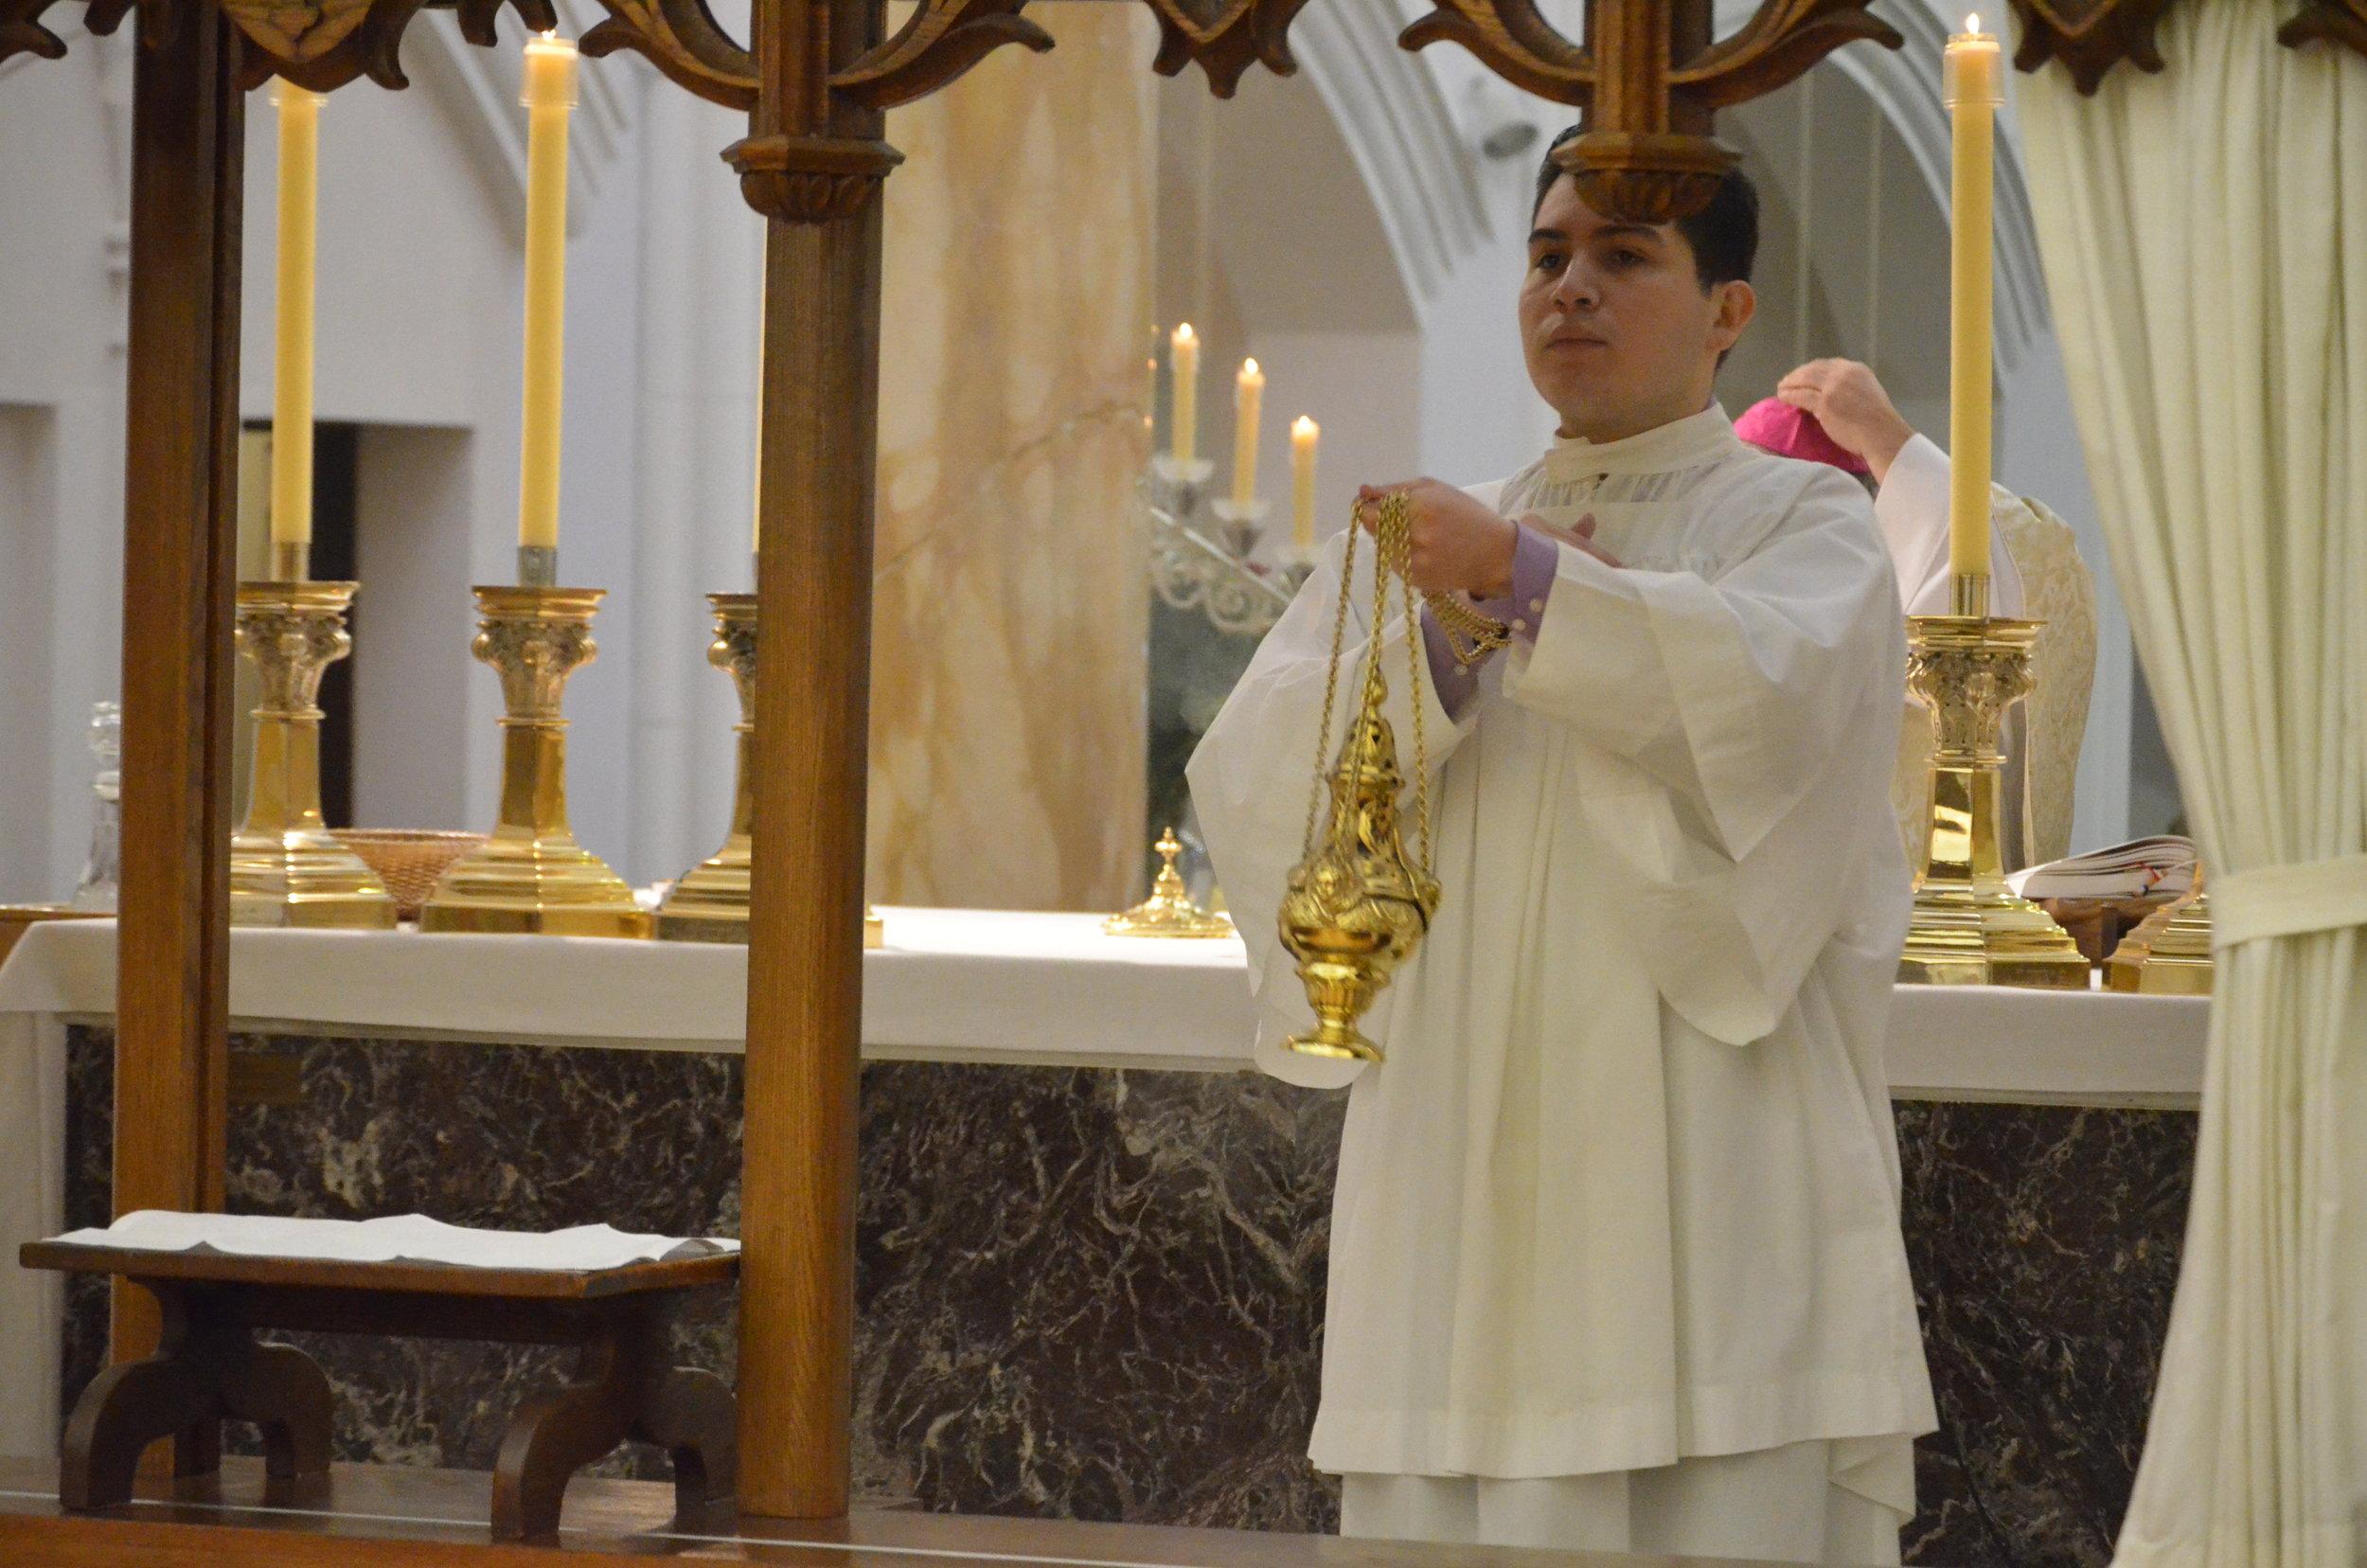 Luis incenses the nuns